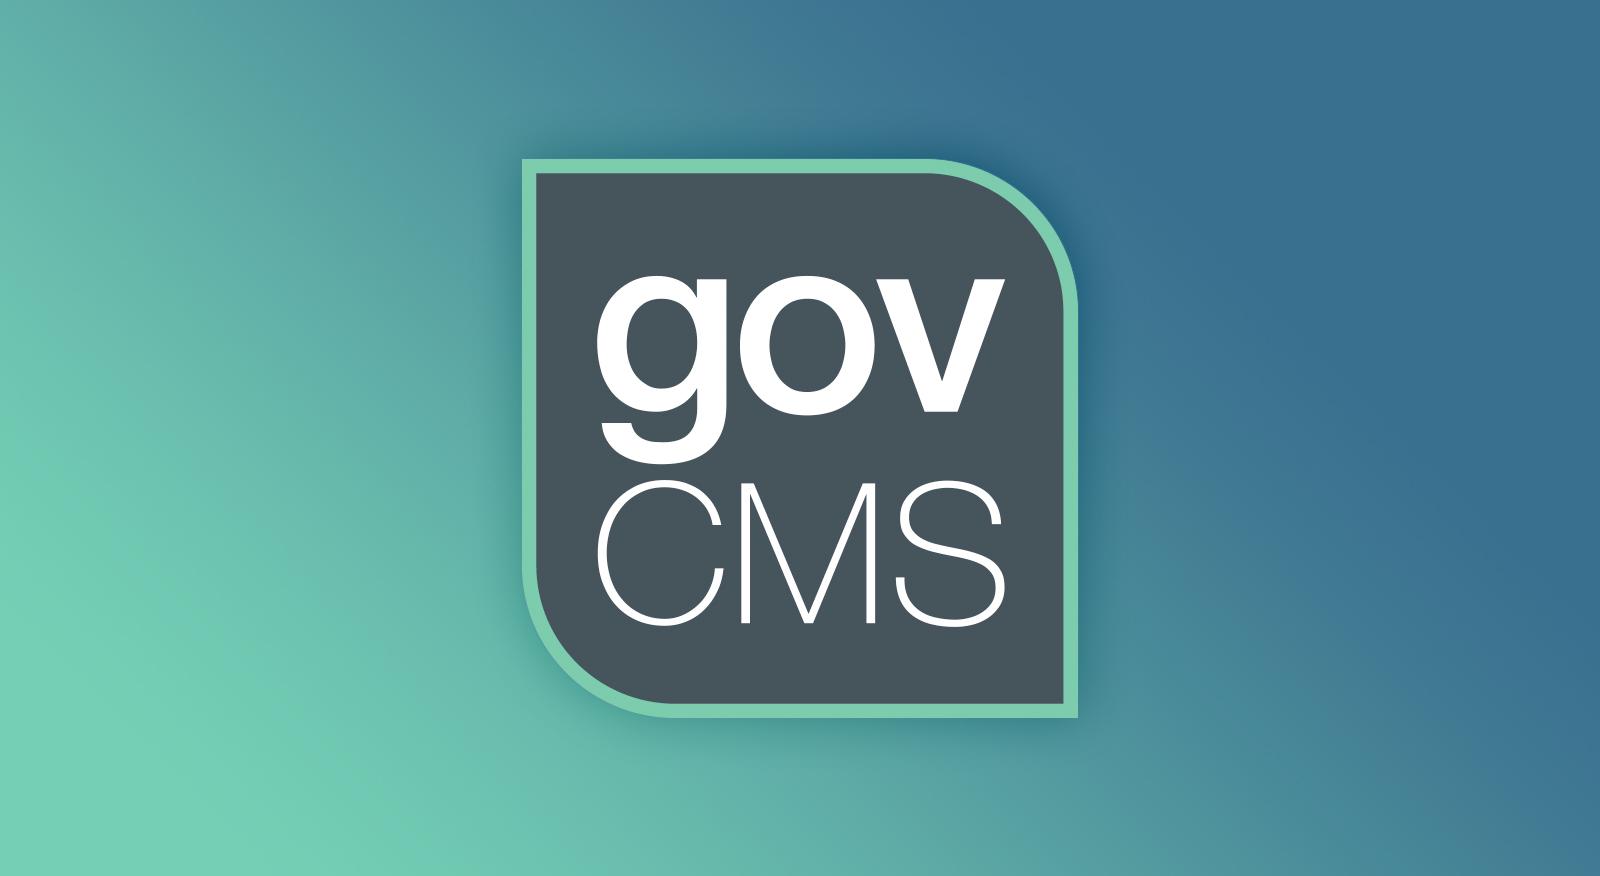 govcms-australia-drupal-onepoint-solutions-brisbane-web-design